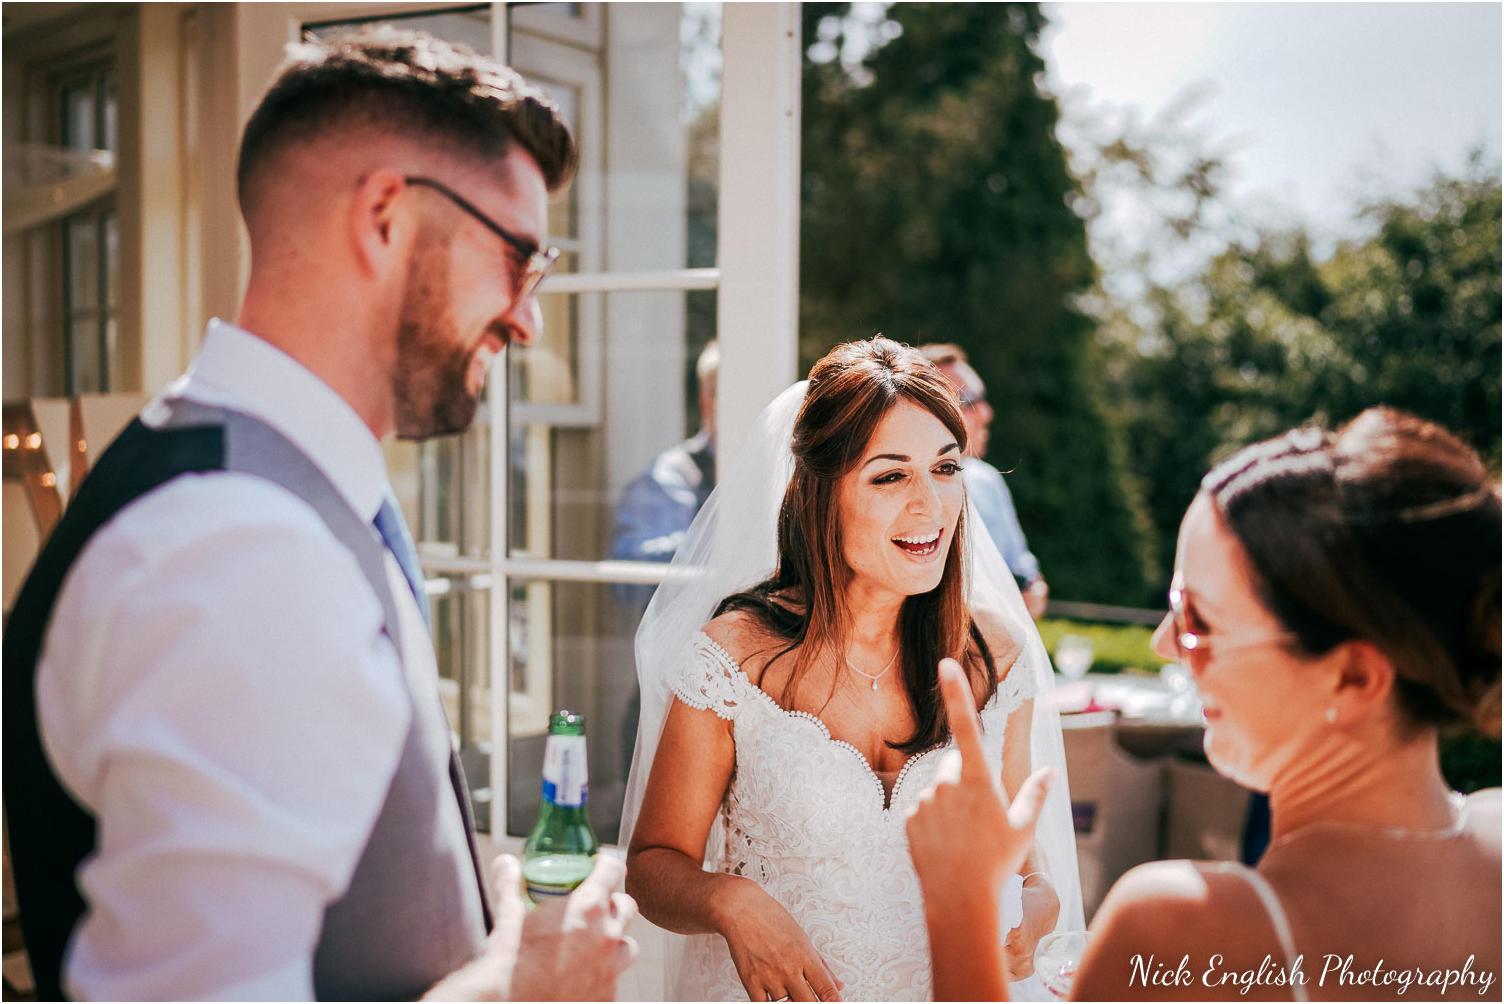 Mitton_Hall_Wedding_Photographer-54.jpg